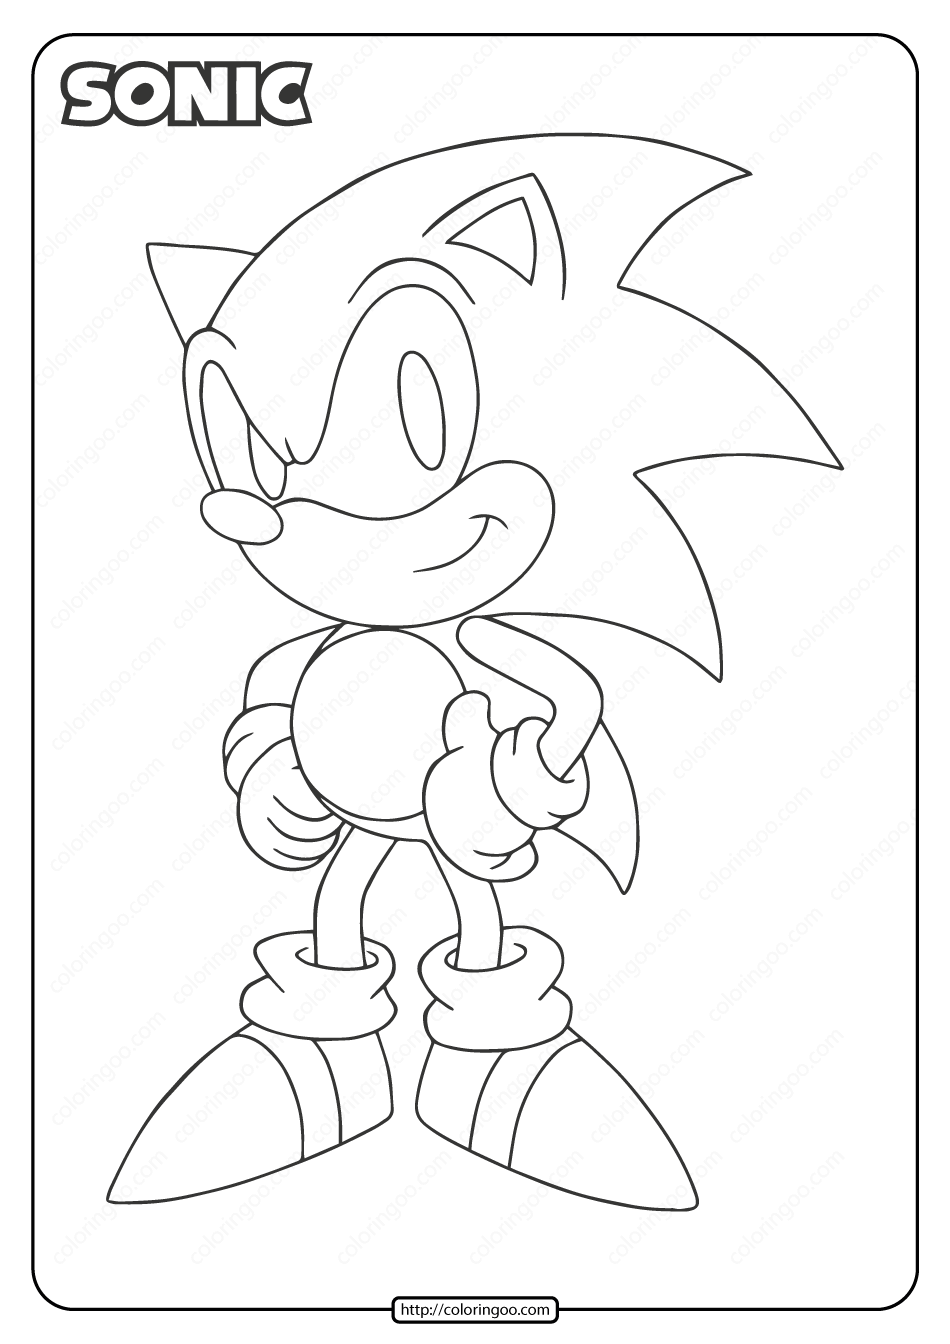 Free Printable Sonic Pdf Coloring Page